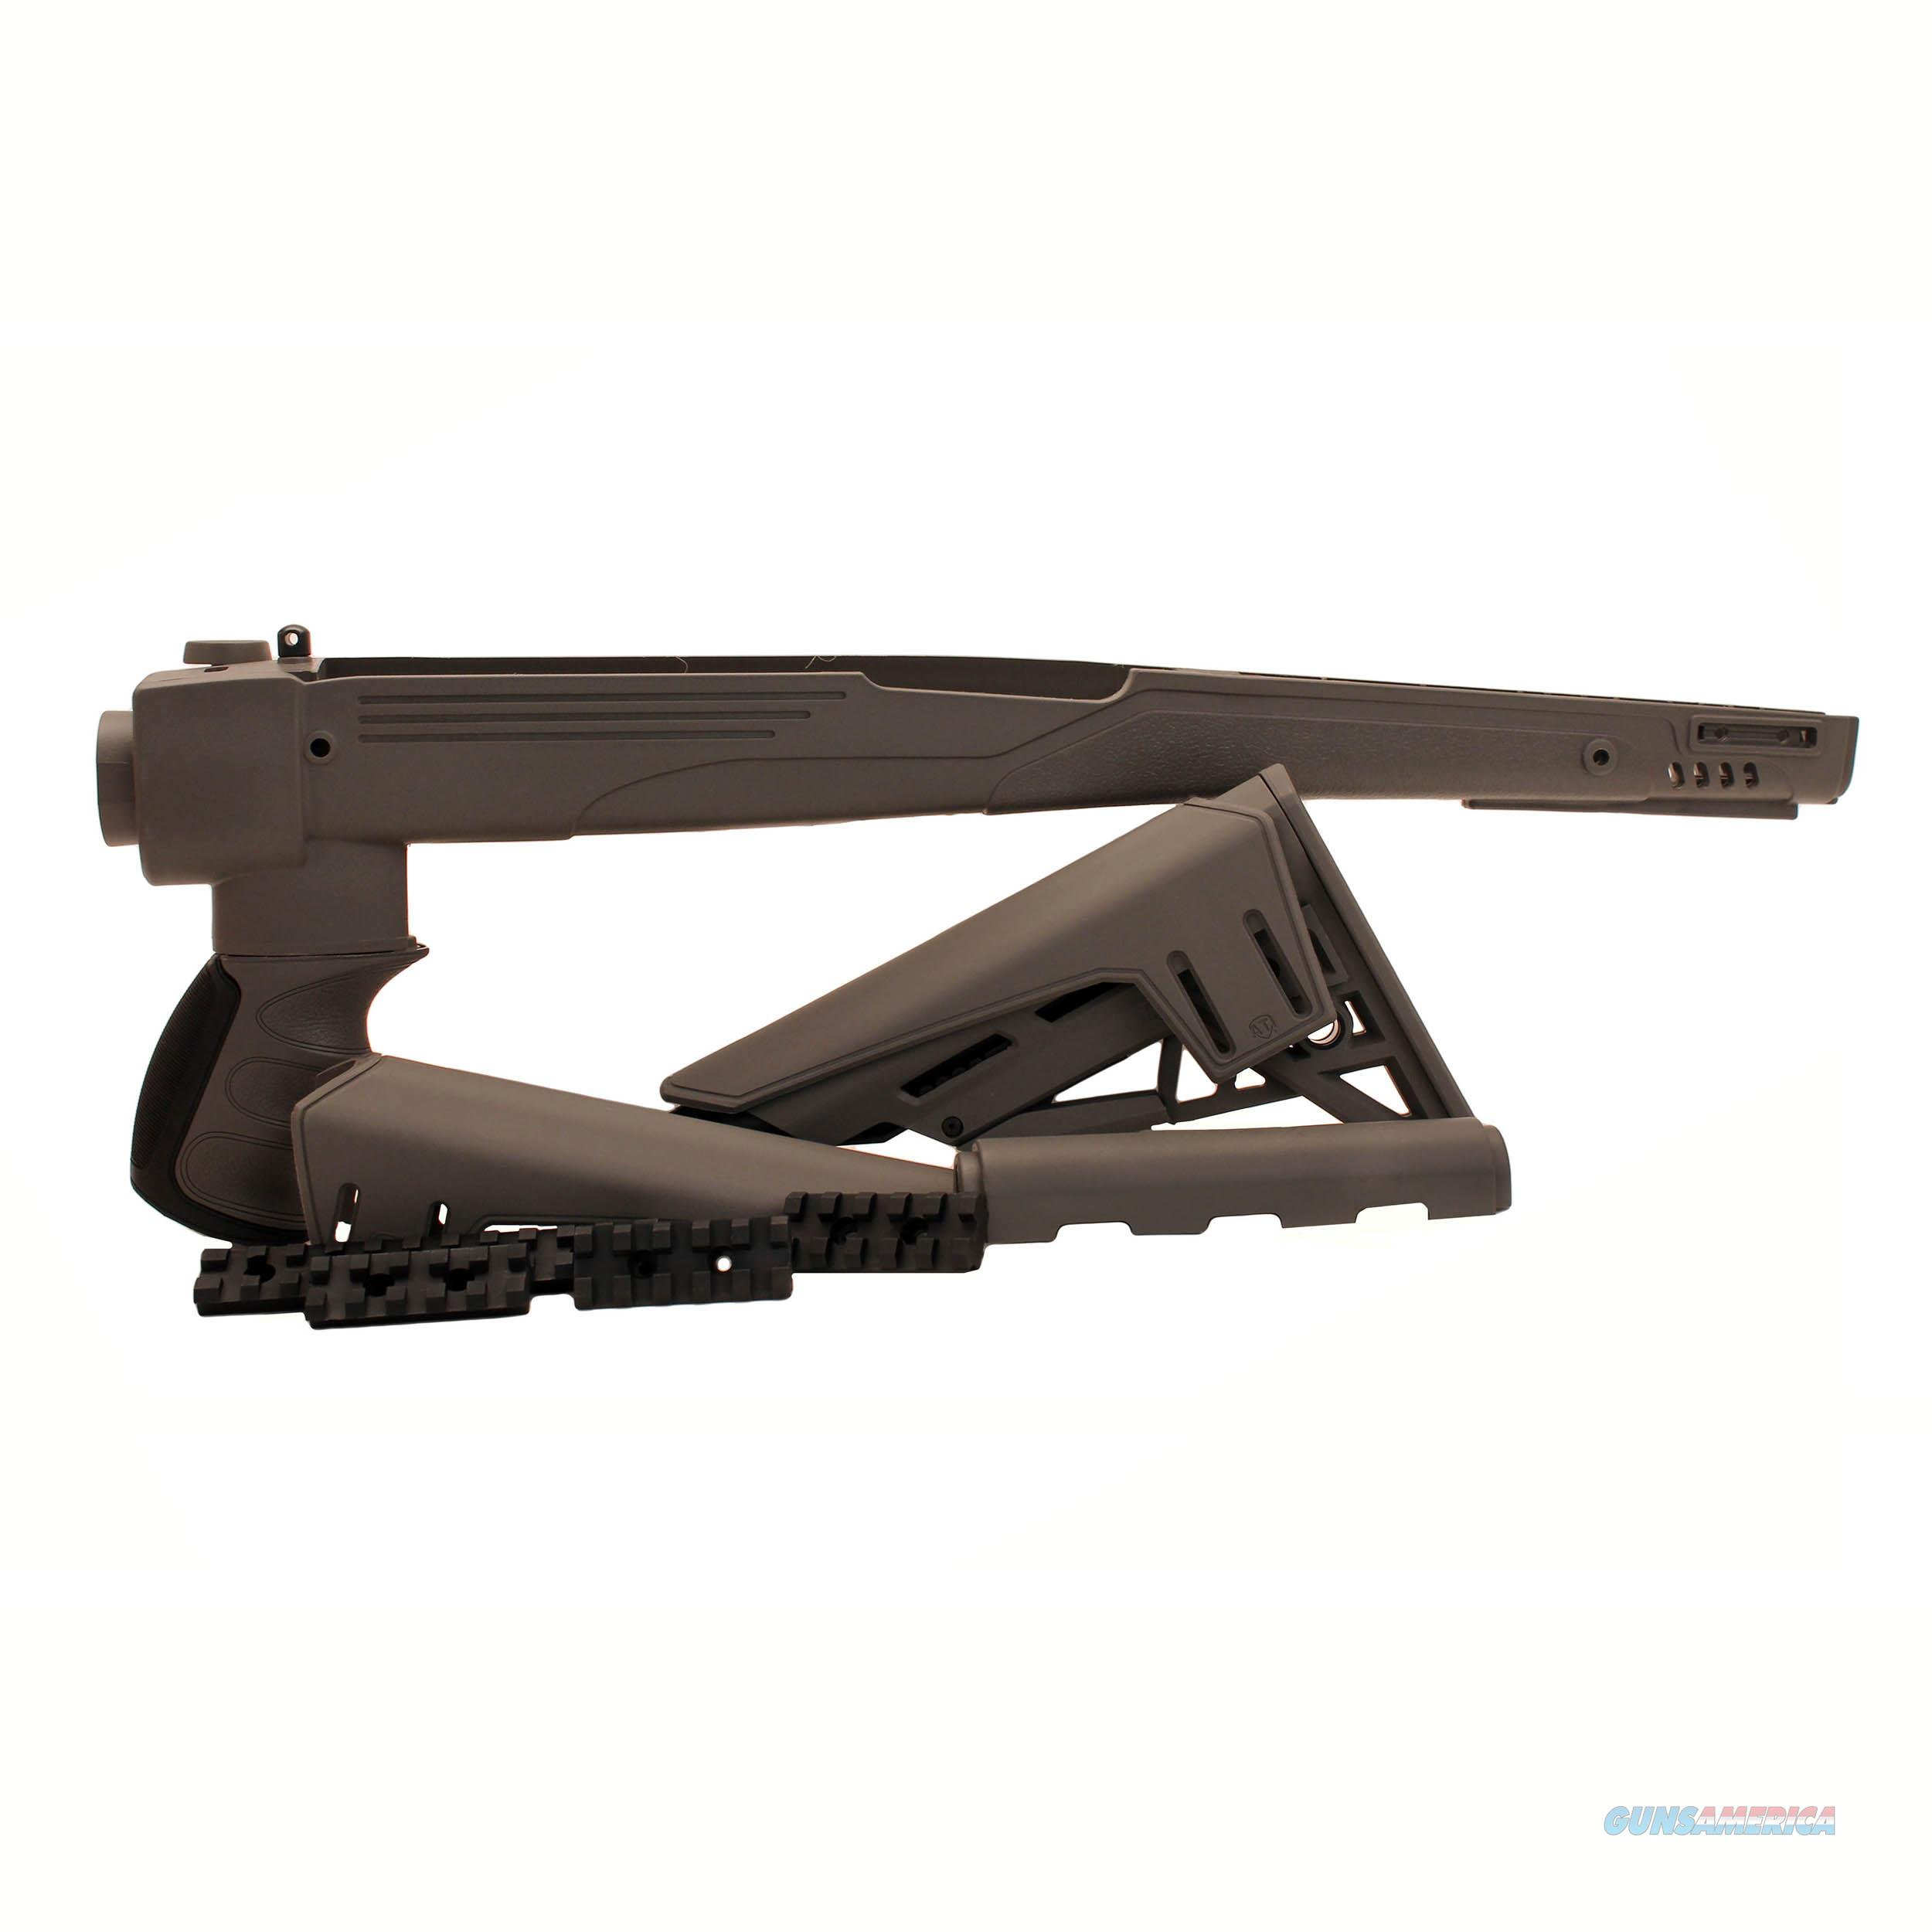 Advanced Technology Sks Tactlite Adjustable Sde Folding Stock B.2.40.1232  Non-Guns > Gunstocks, Grips & Wood